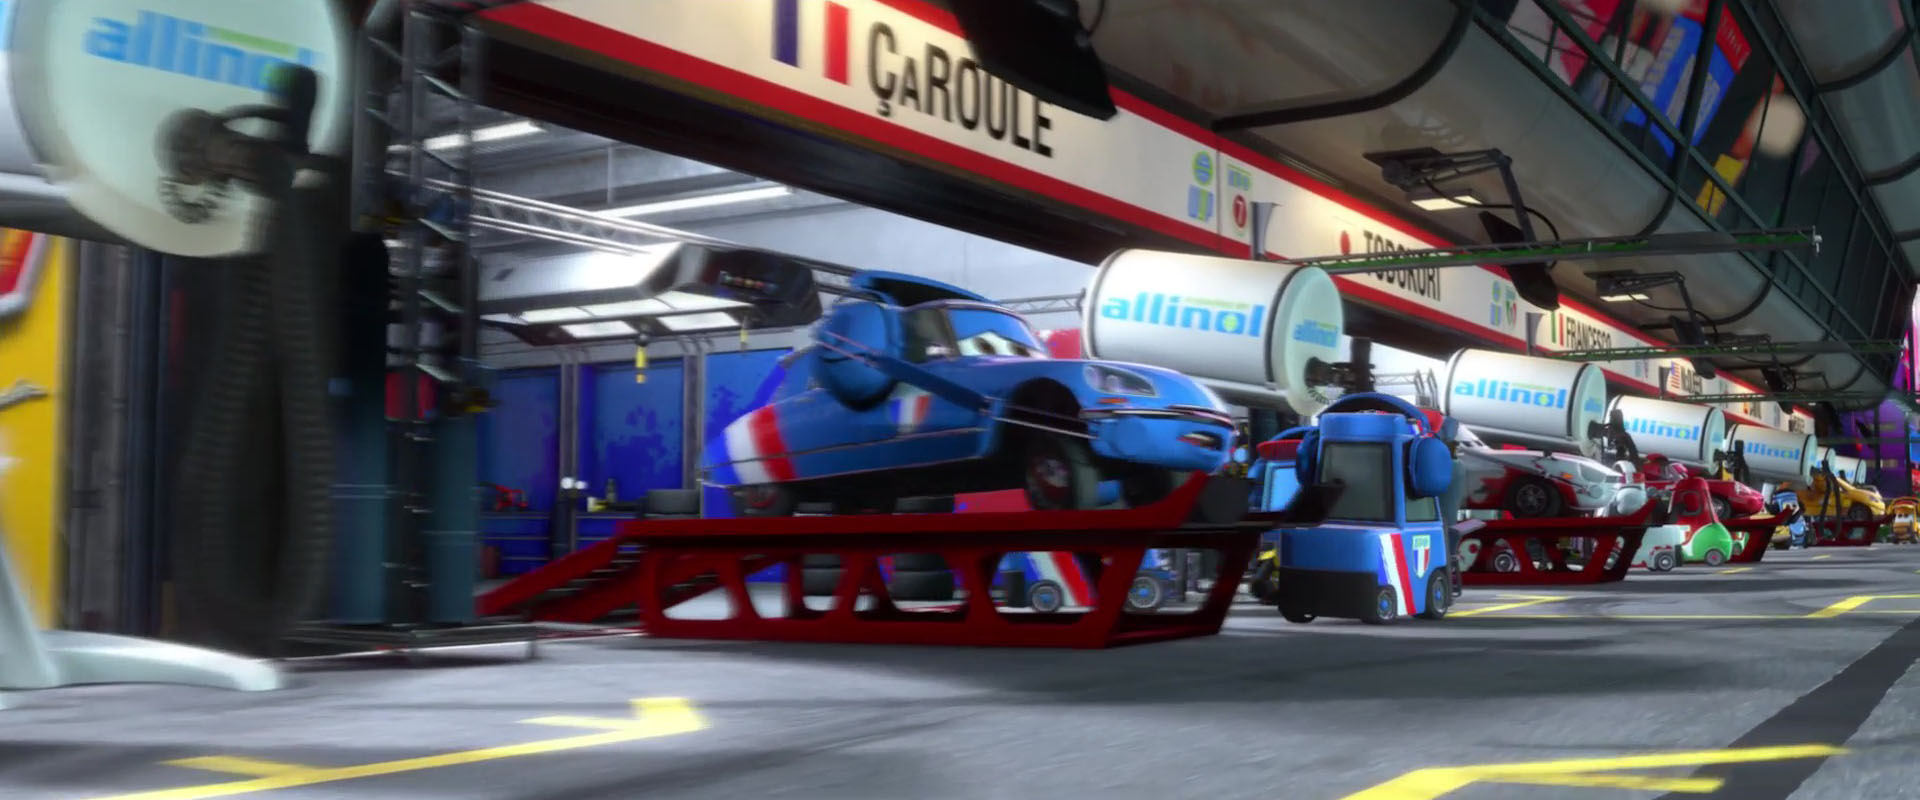 bruno motoreau personnage character pixar disney cars 2